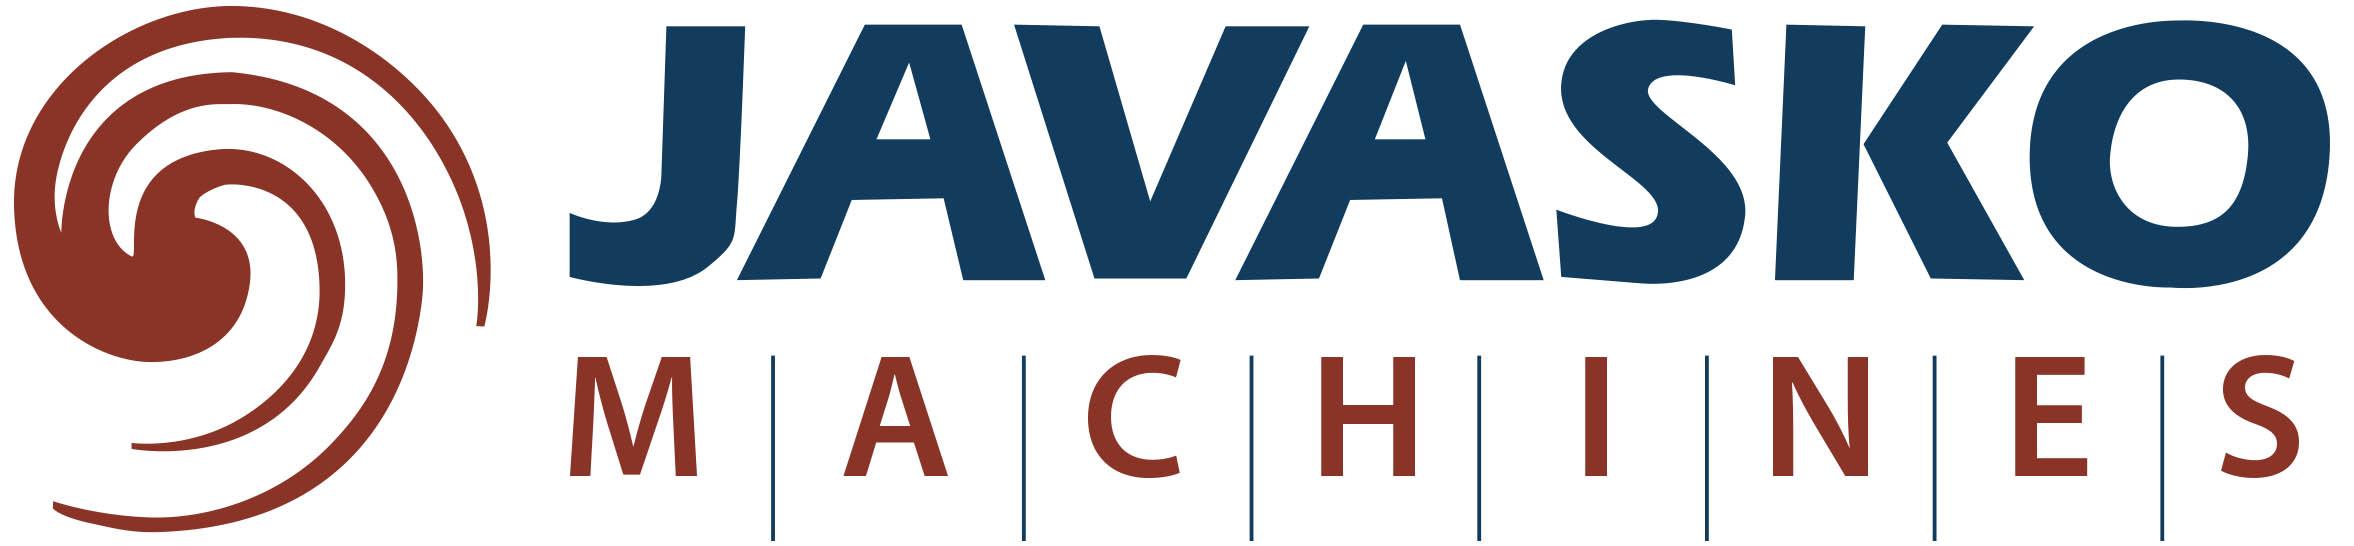 Javasko Machines